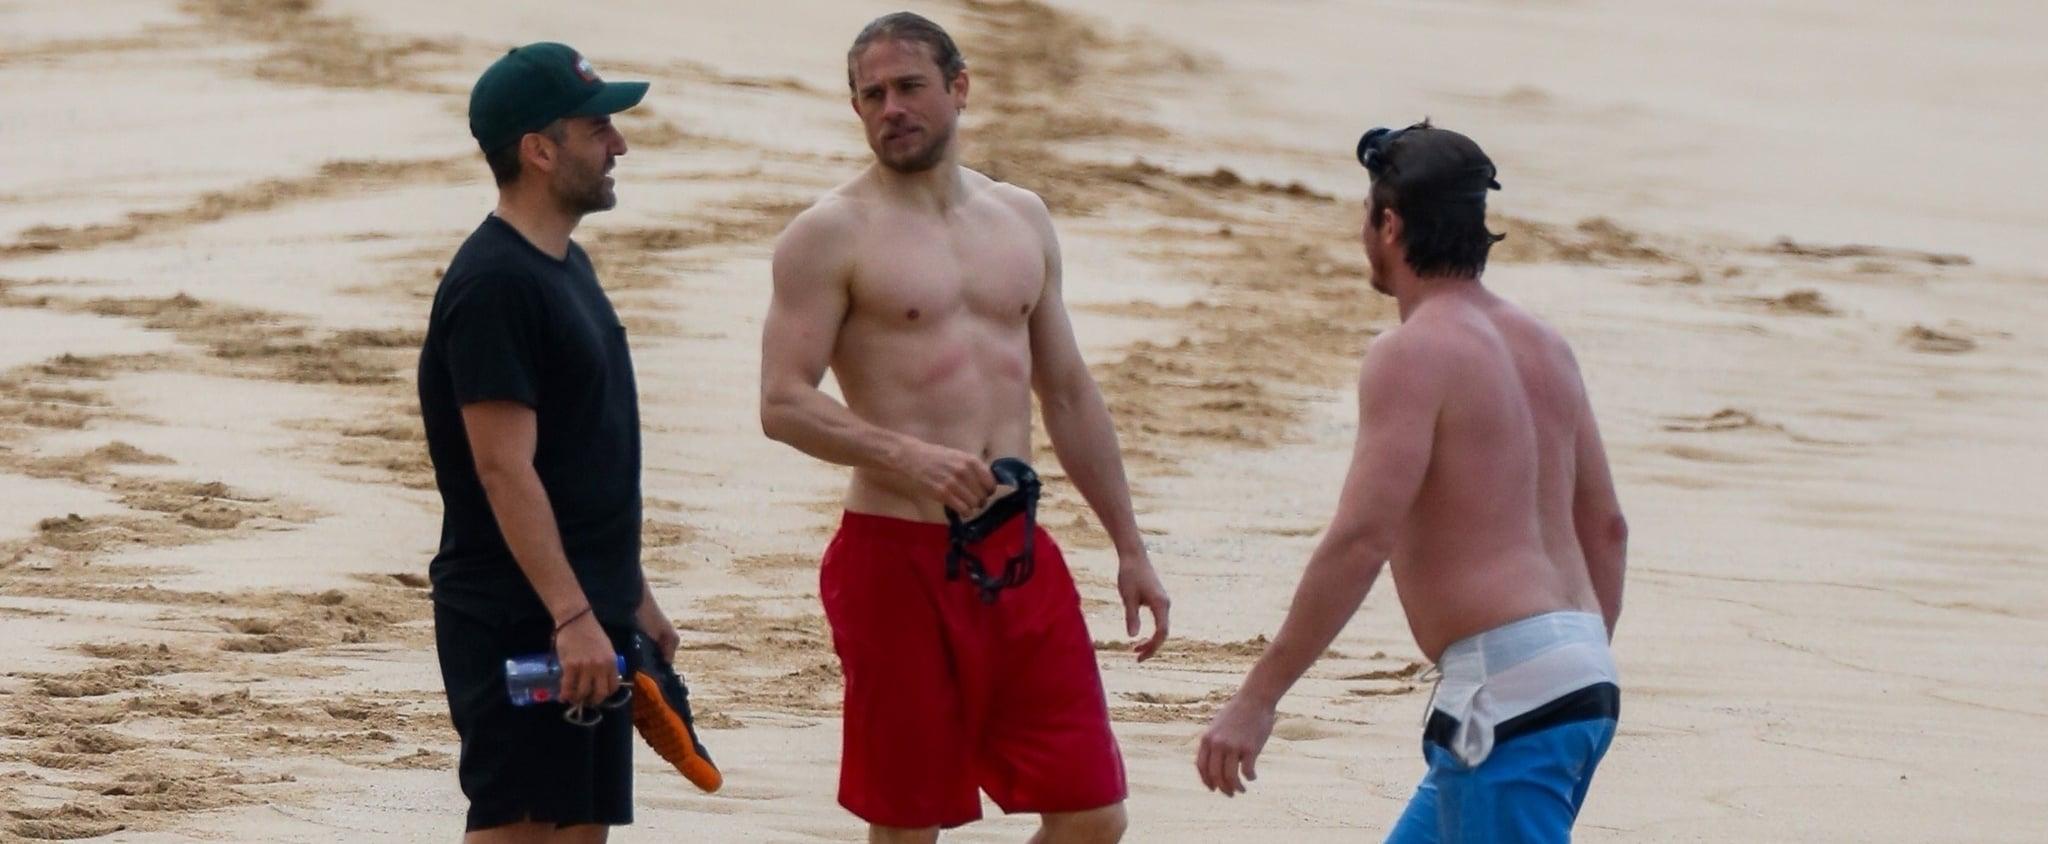 Literally Just 200+ Photos of Shirtless Charlie, Ben, Oscar, and Garrett Having a Blast on the Beach!